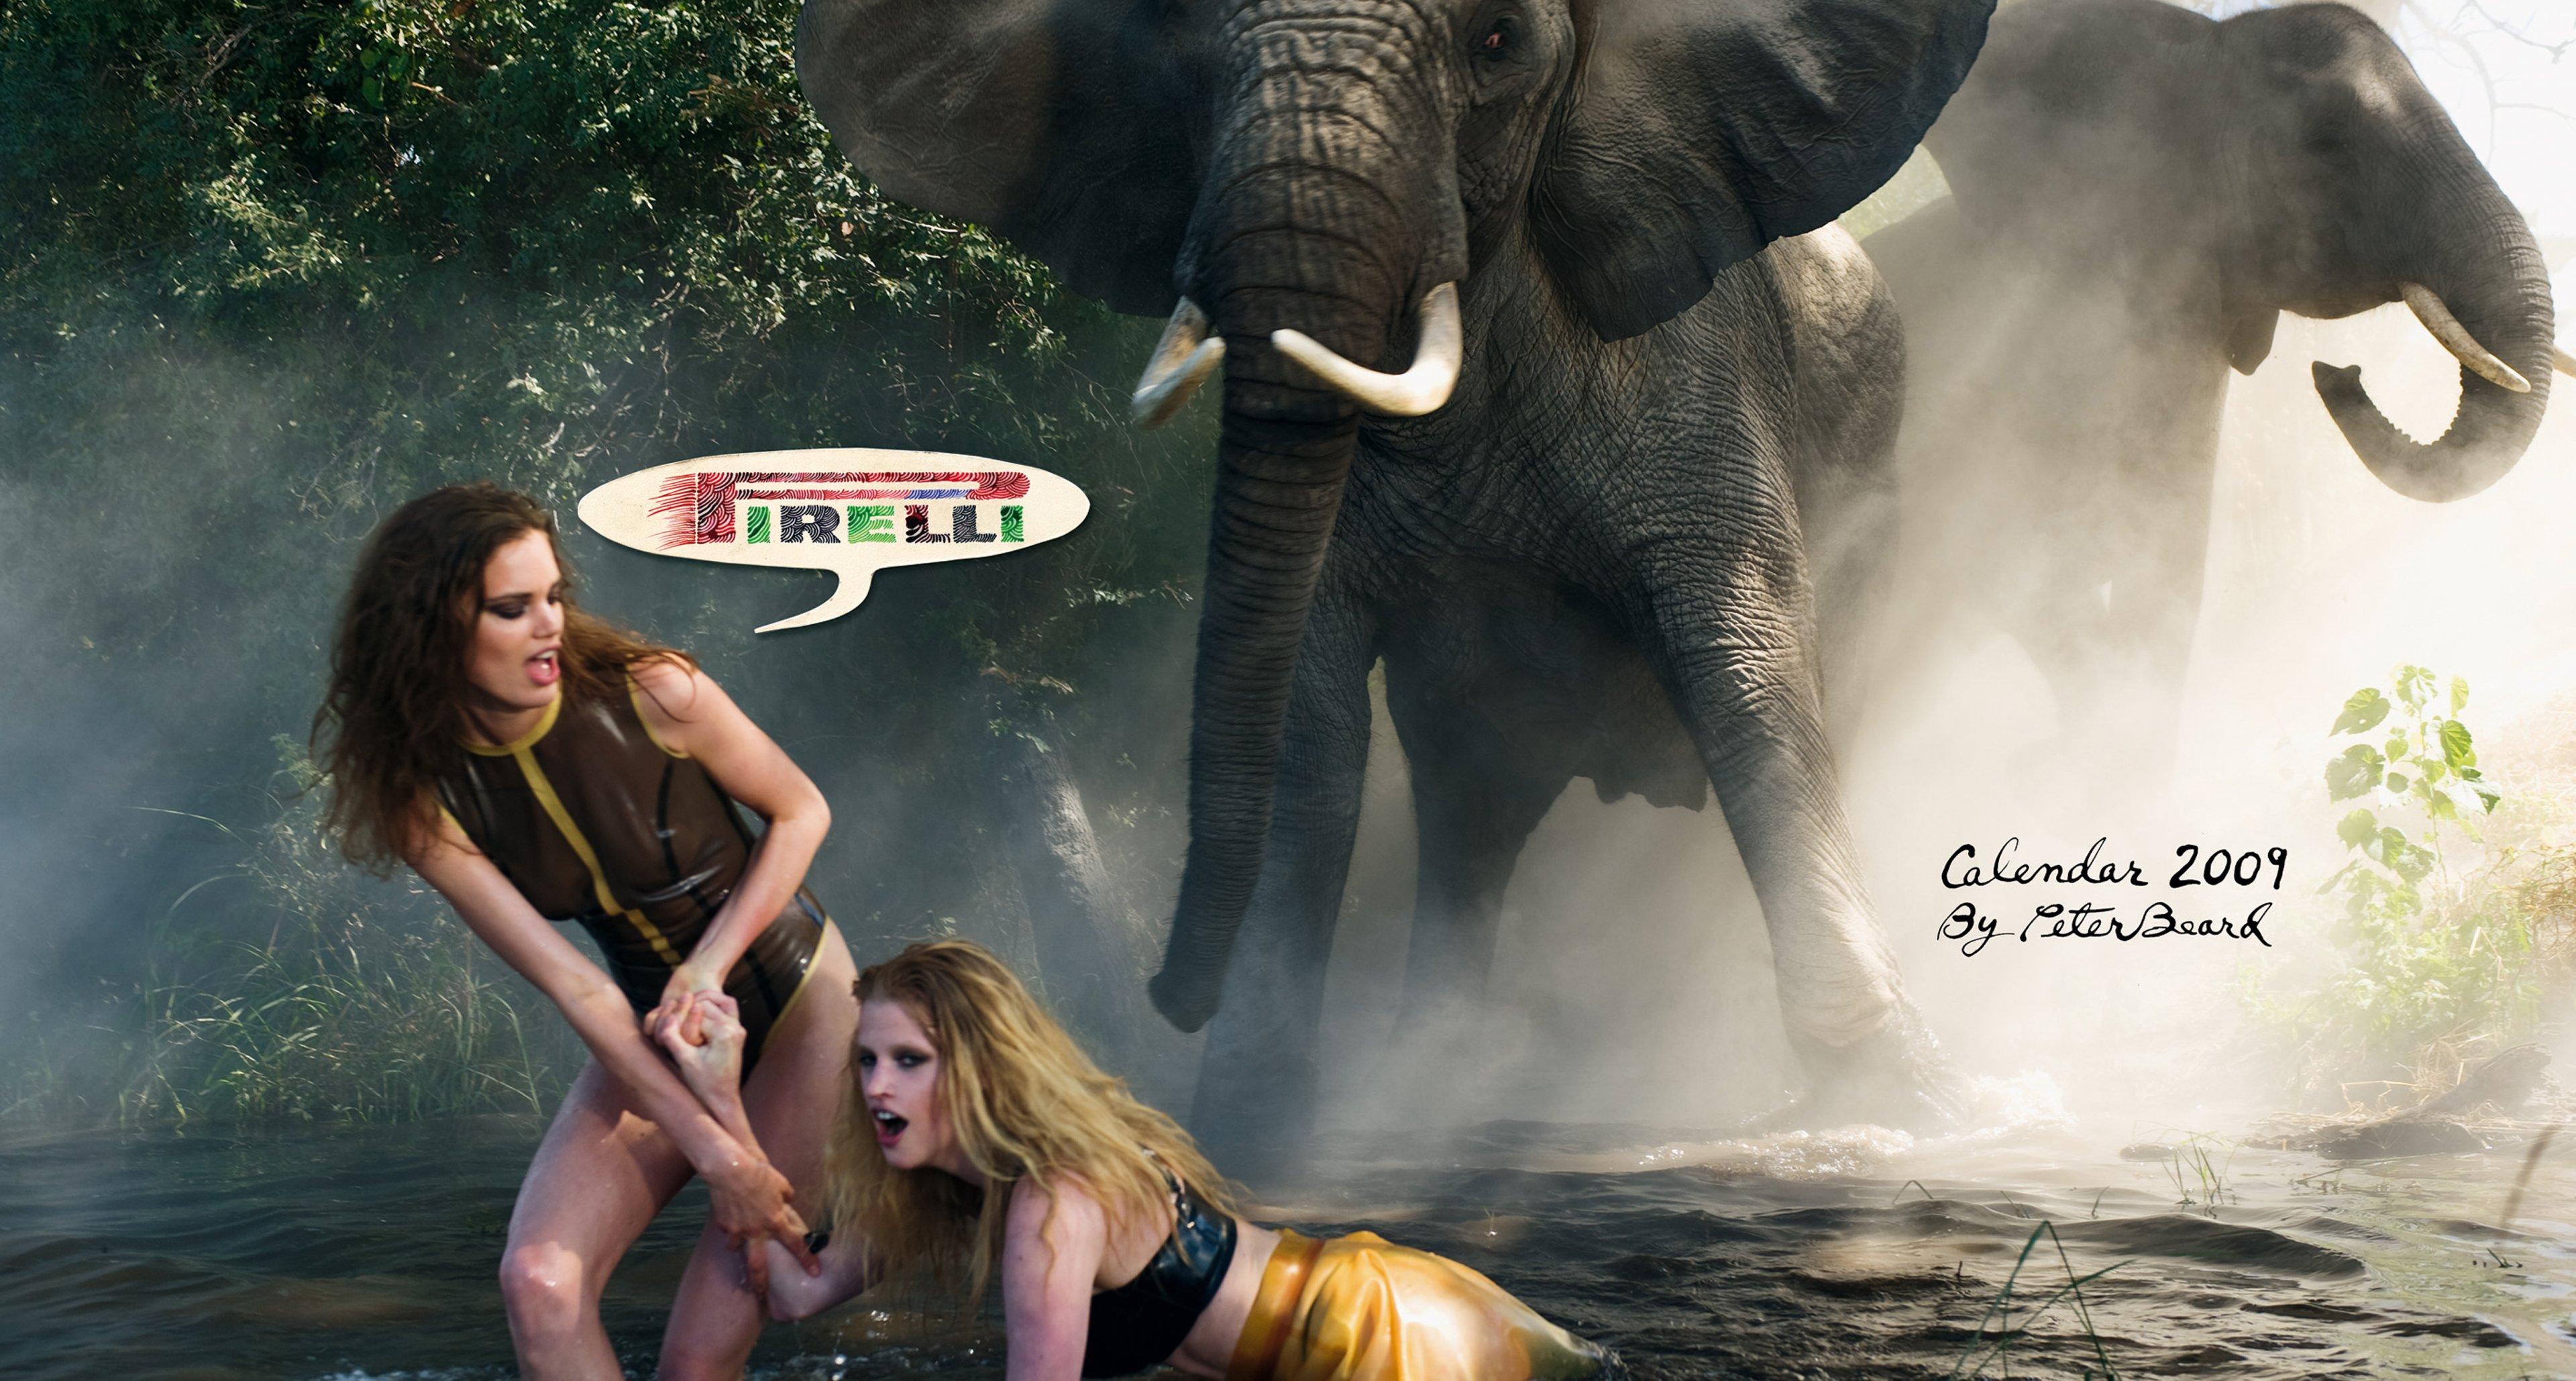 Pirelli Calendar 2009: Shot by Peter Beard in Botswana